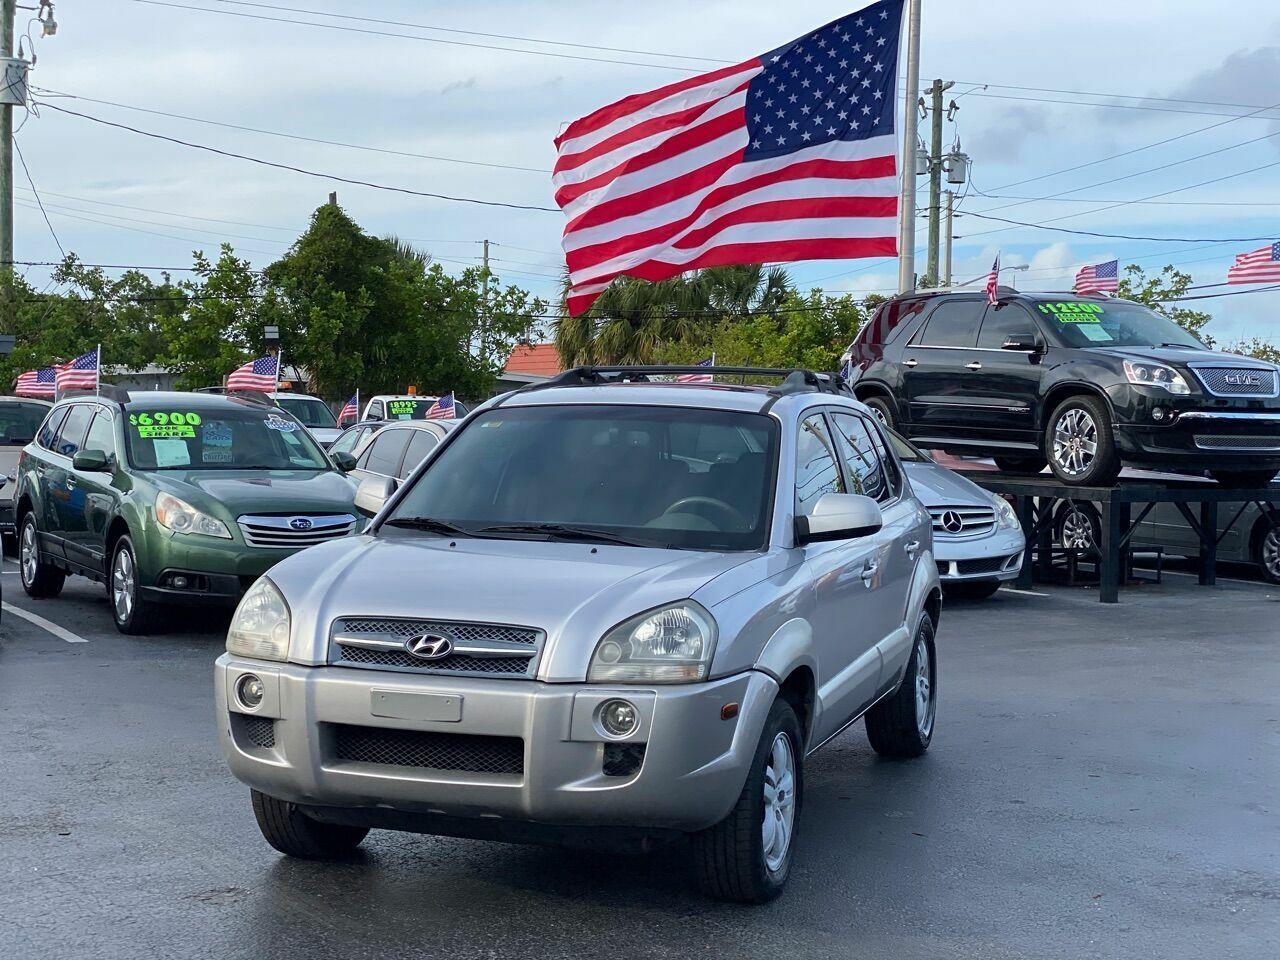 2006 Hyundai Tucson Limited SUV Runs Good Truck COLD AC FLORIDA L@@K WOW NICE